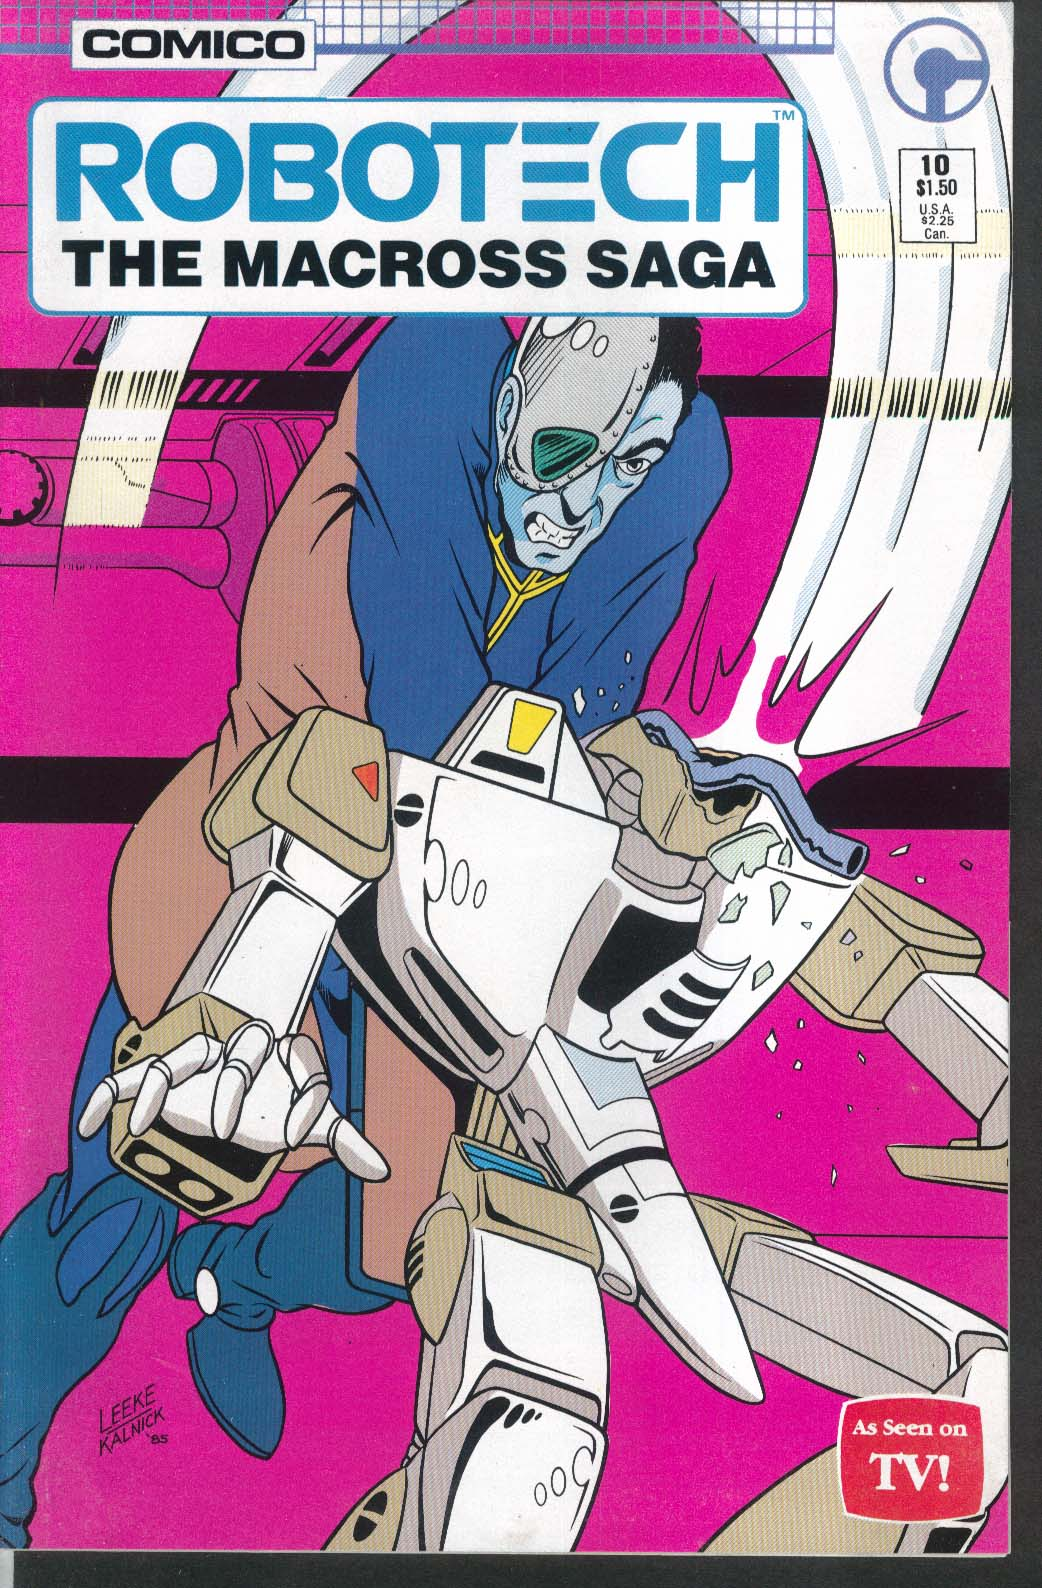 ROBOTECH Macross Saga #10 Comico comic book 3 1986